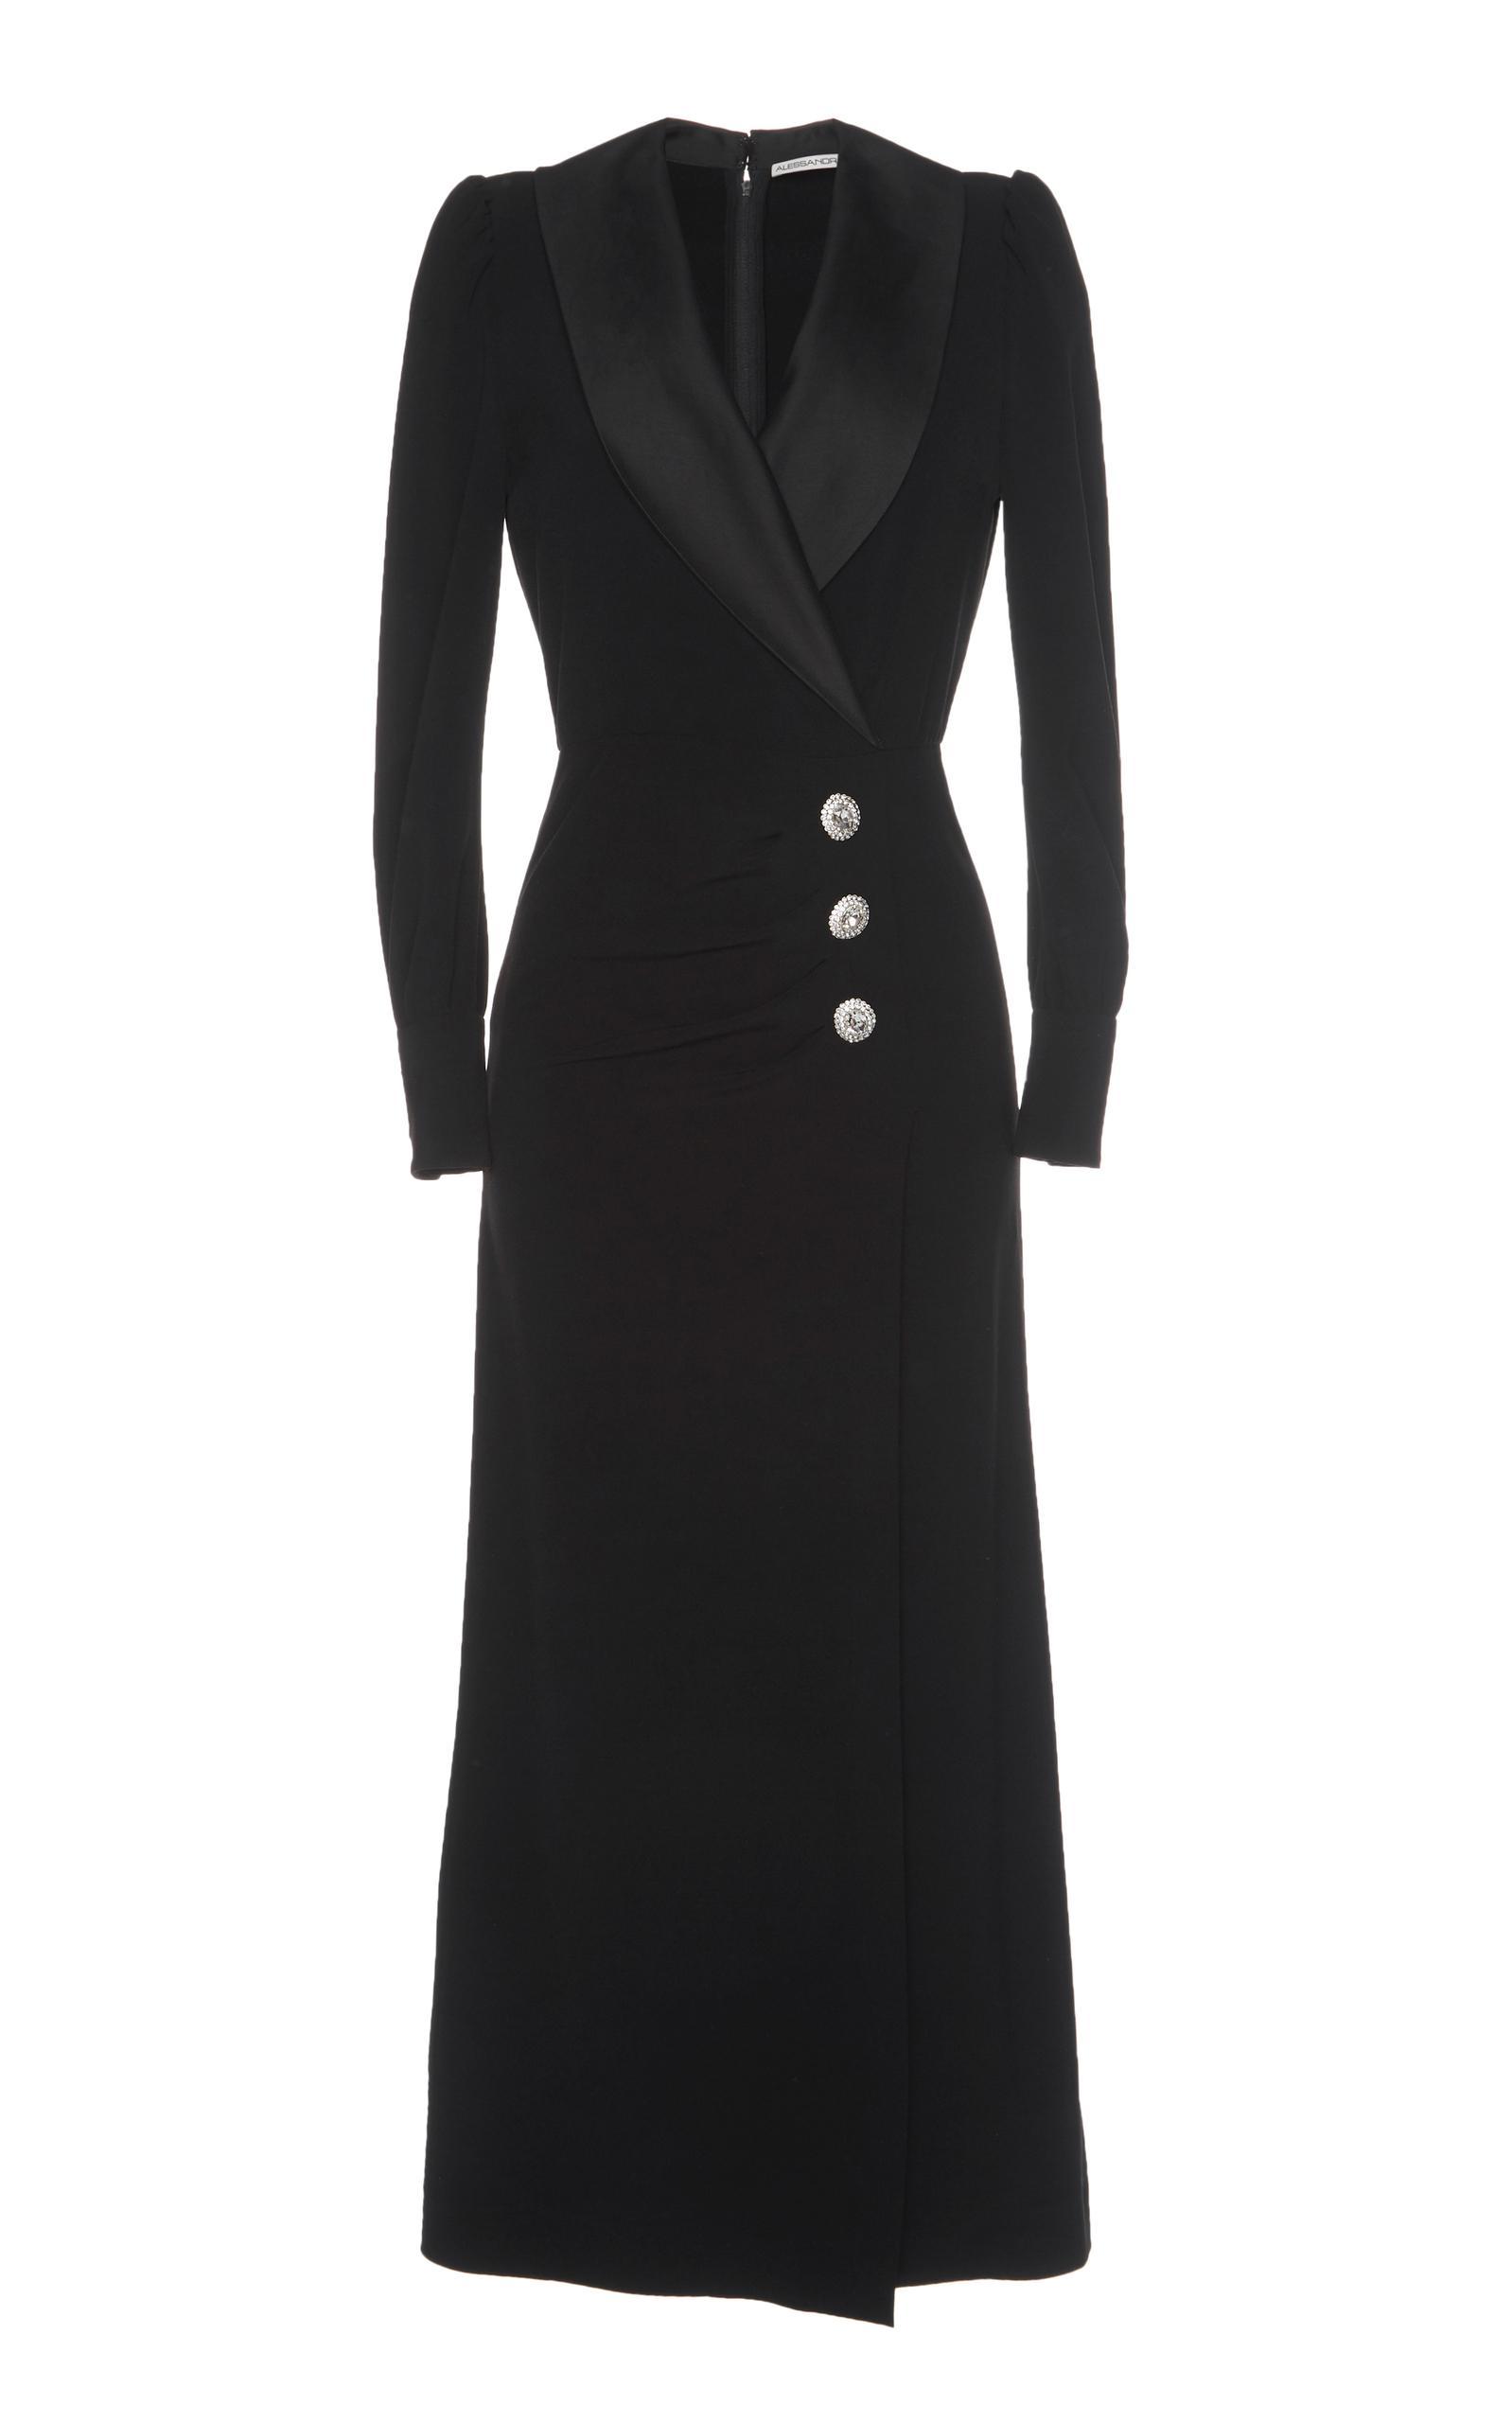 Alessandra Rich Long Hollywood SablÉ Dress In Black